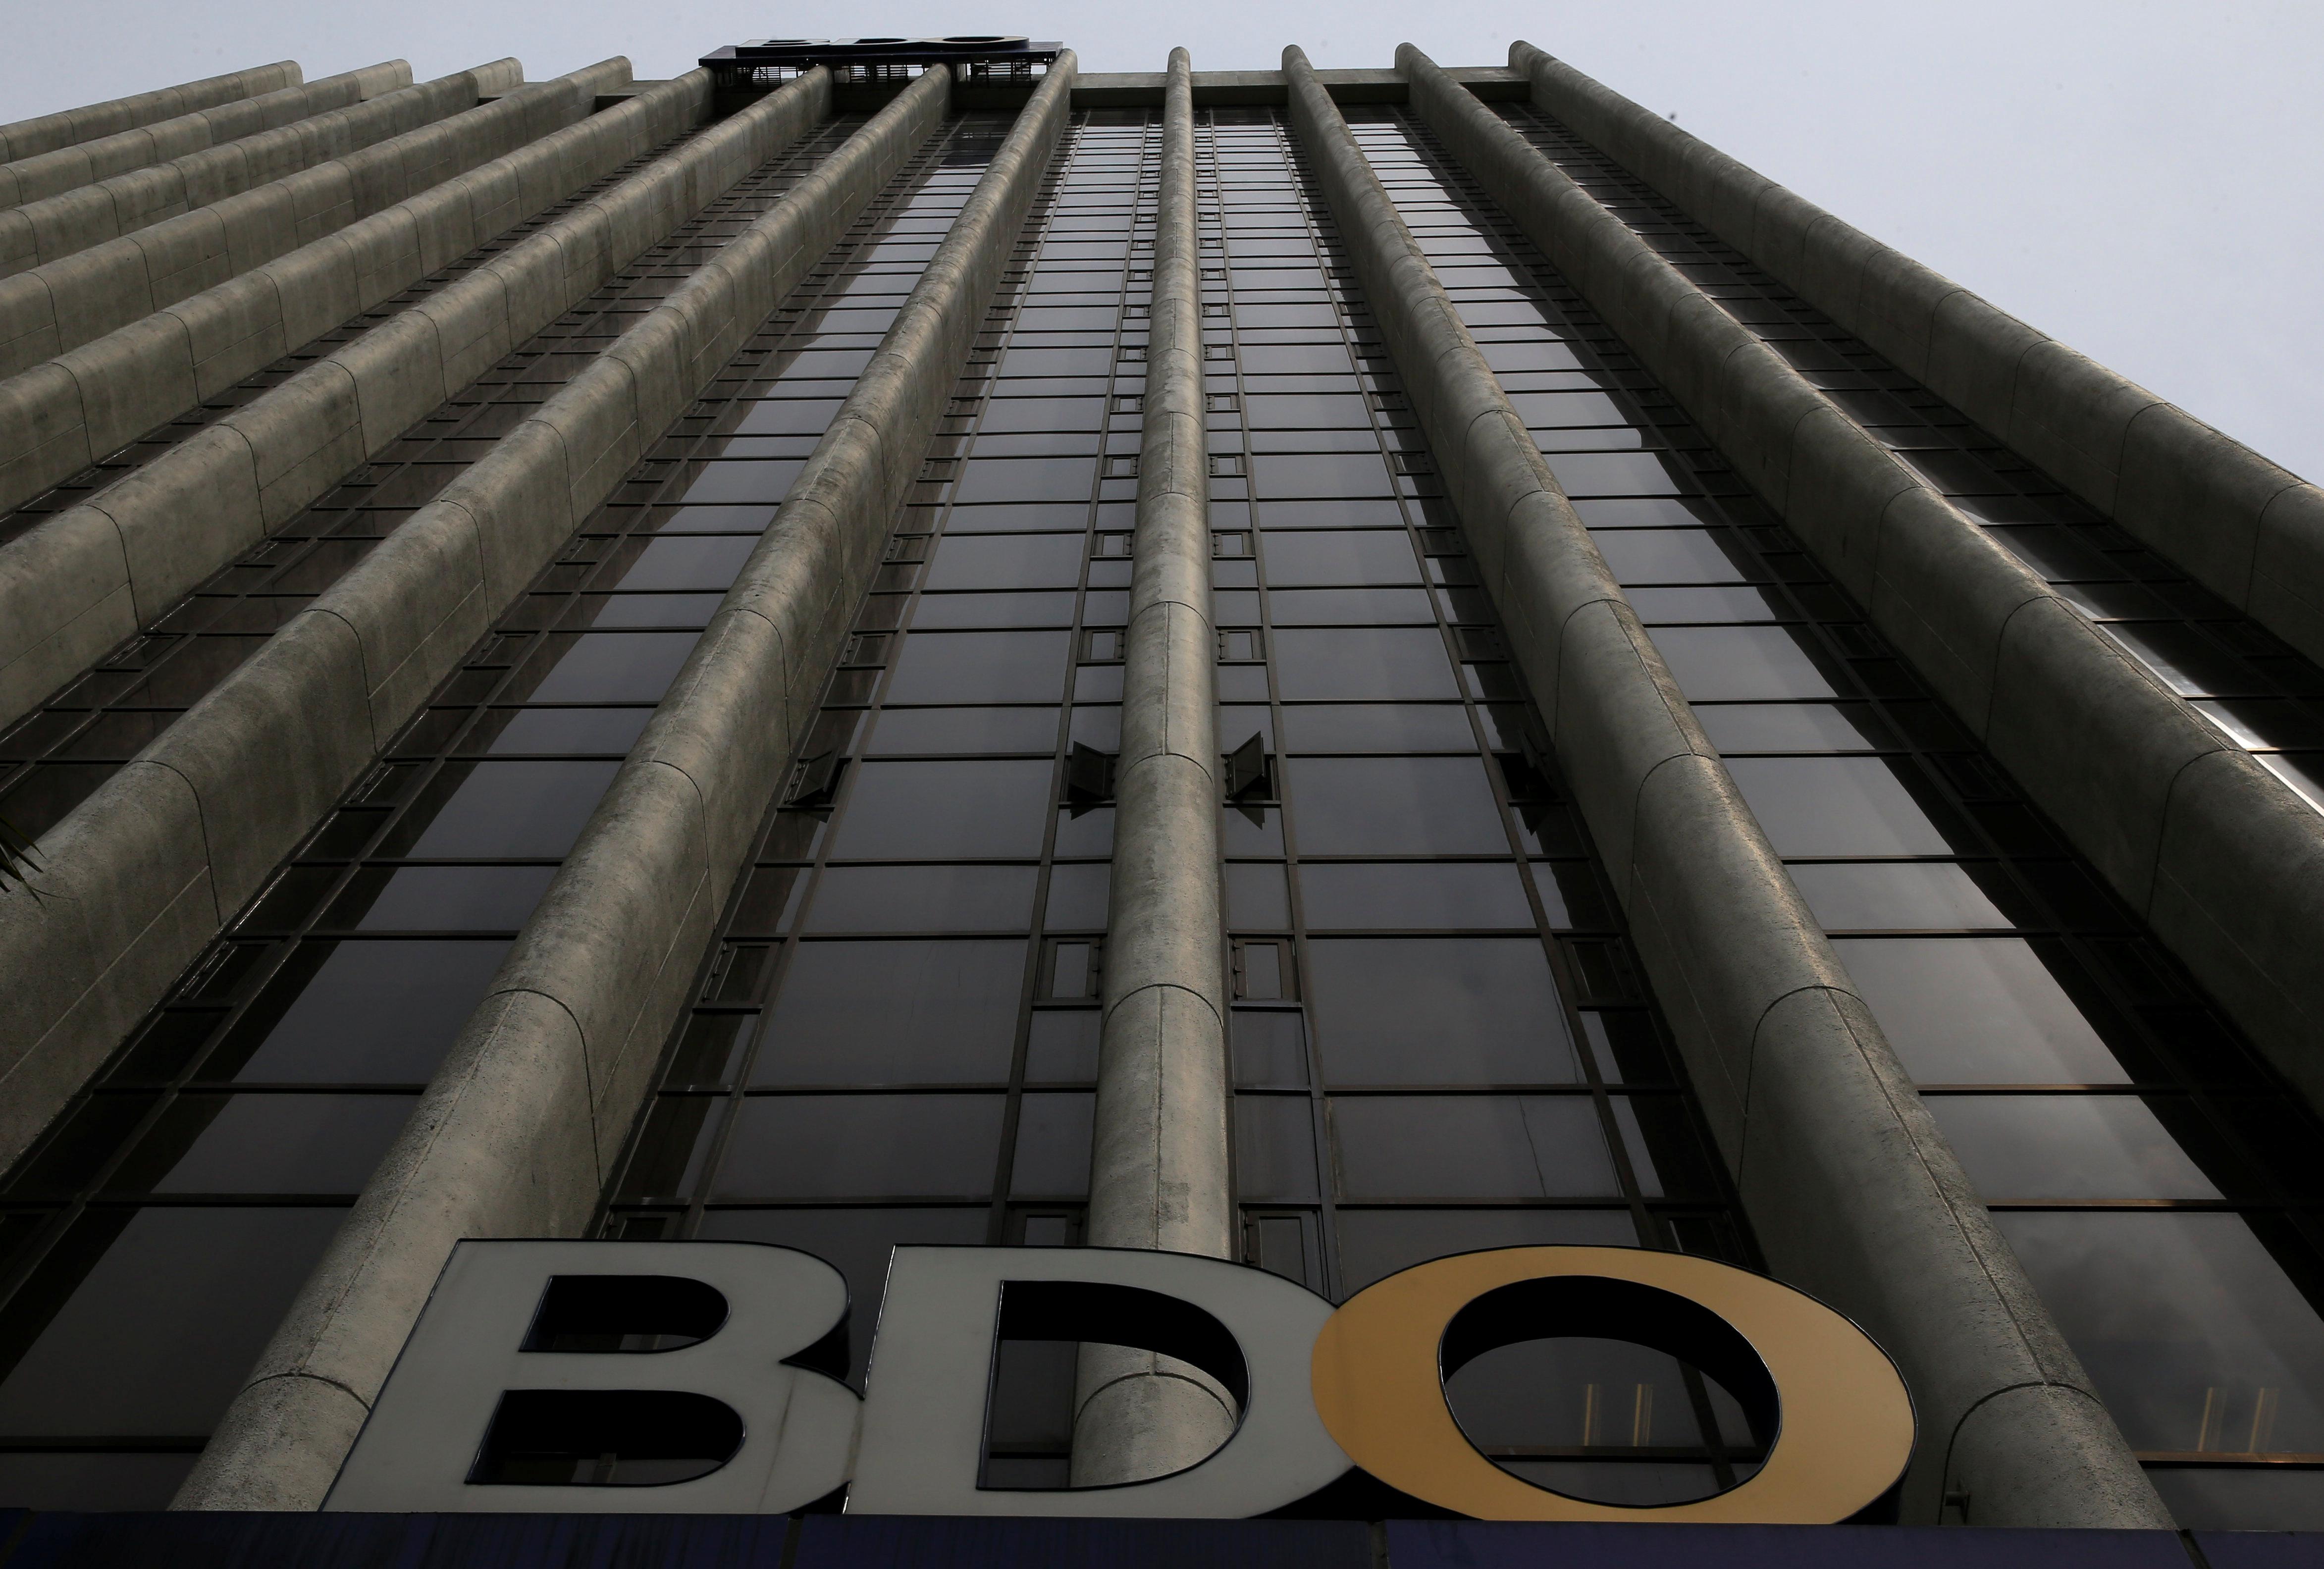 A logo of Philippines' top lender Banco de Oro (BDO) Unibank, Inc. is seen at their main building in Makati city, metro Manila, Philippines. REUTERS/Romeo Ranoco